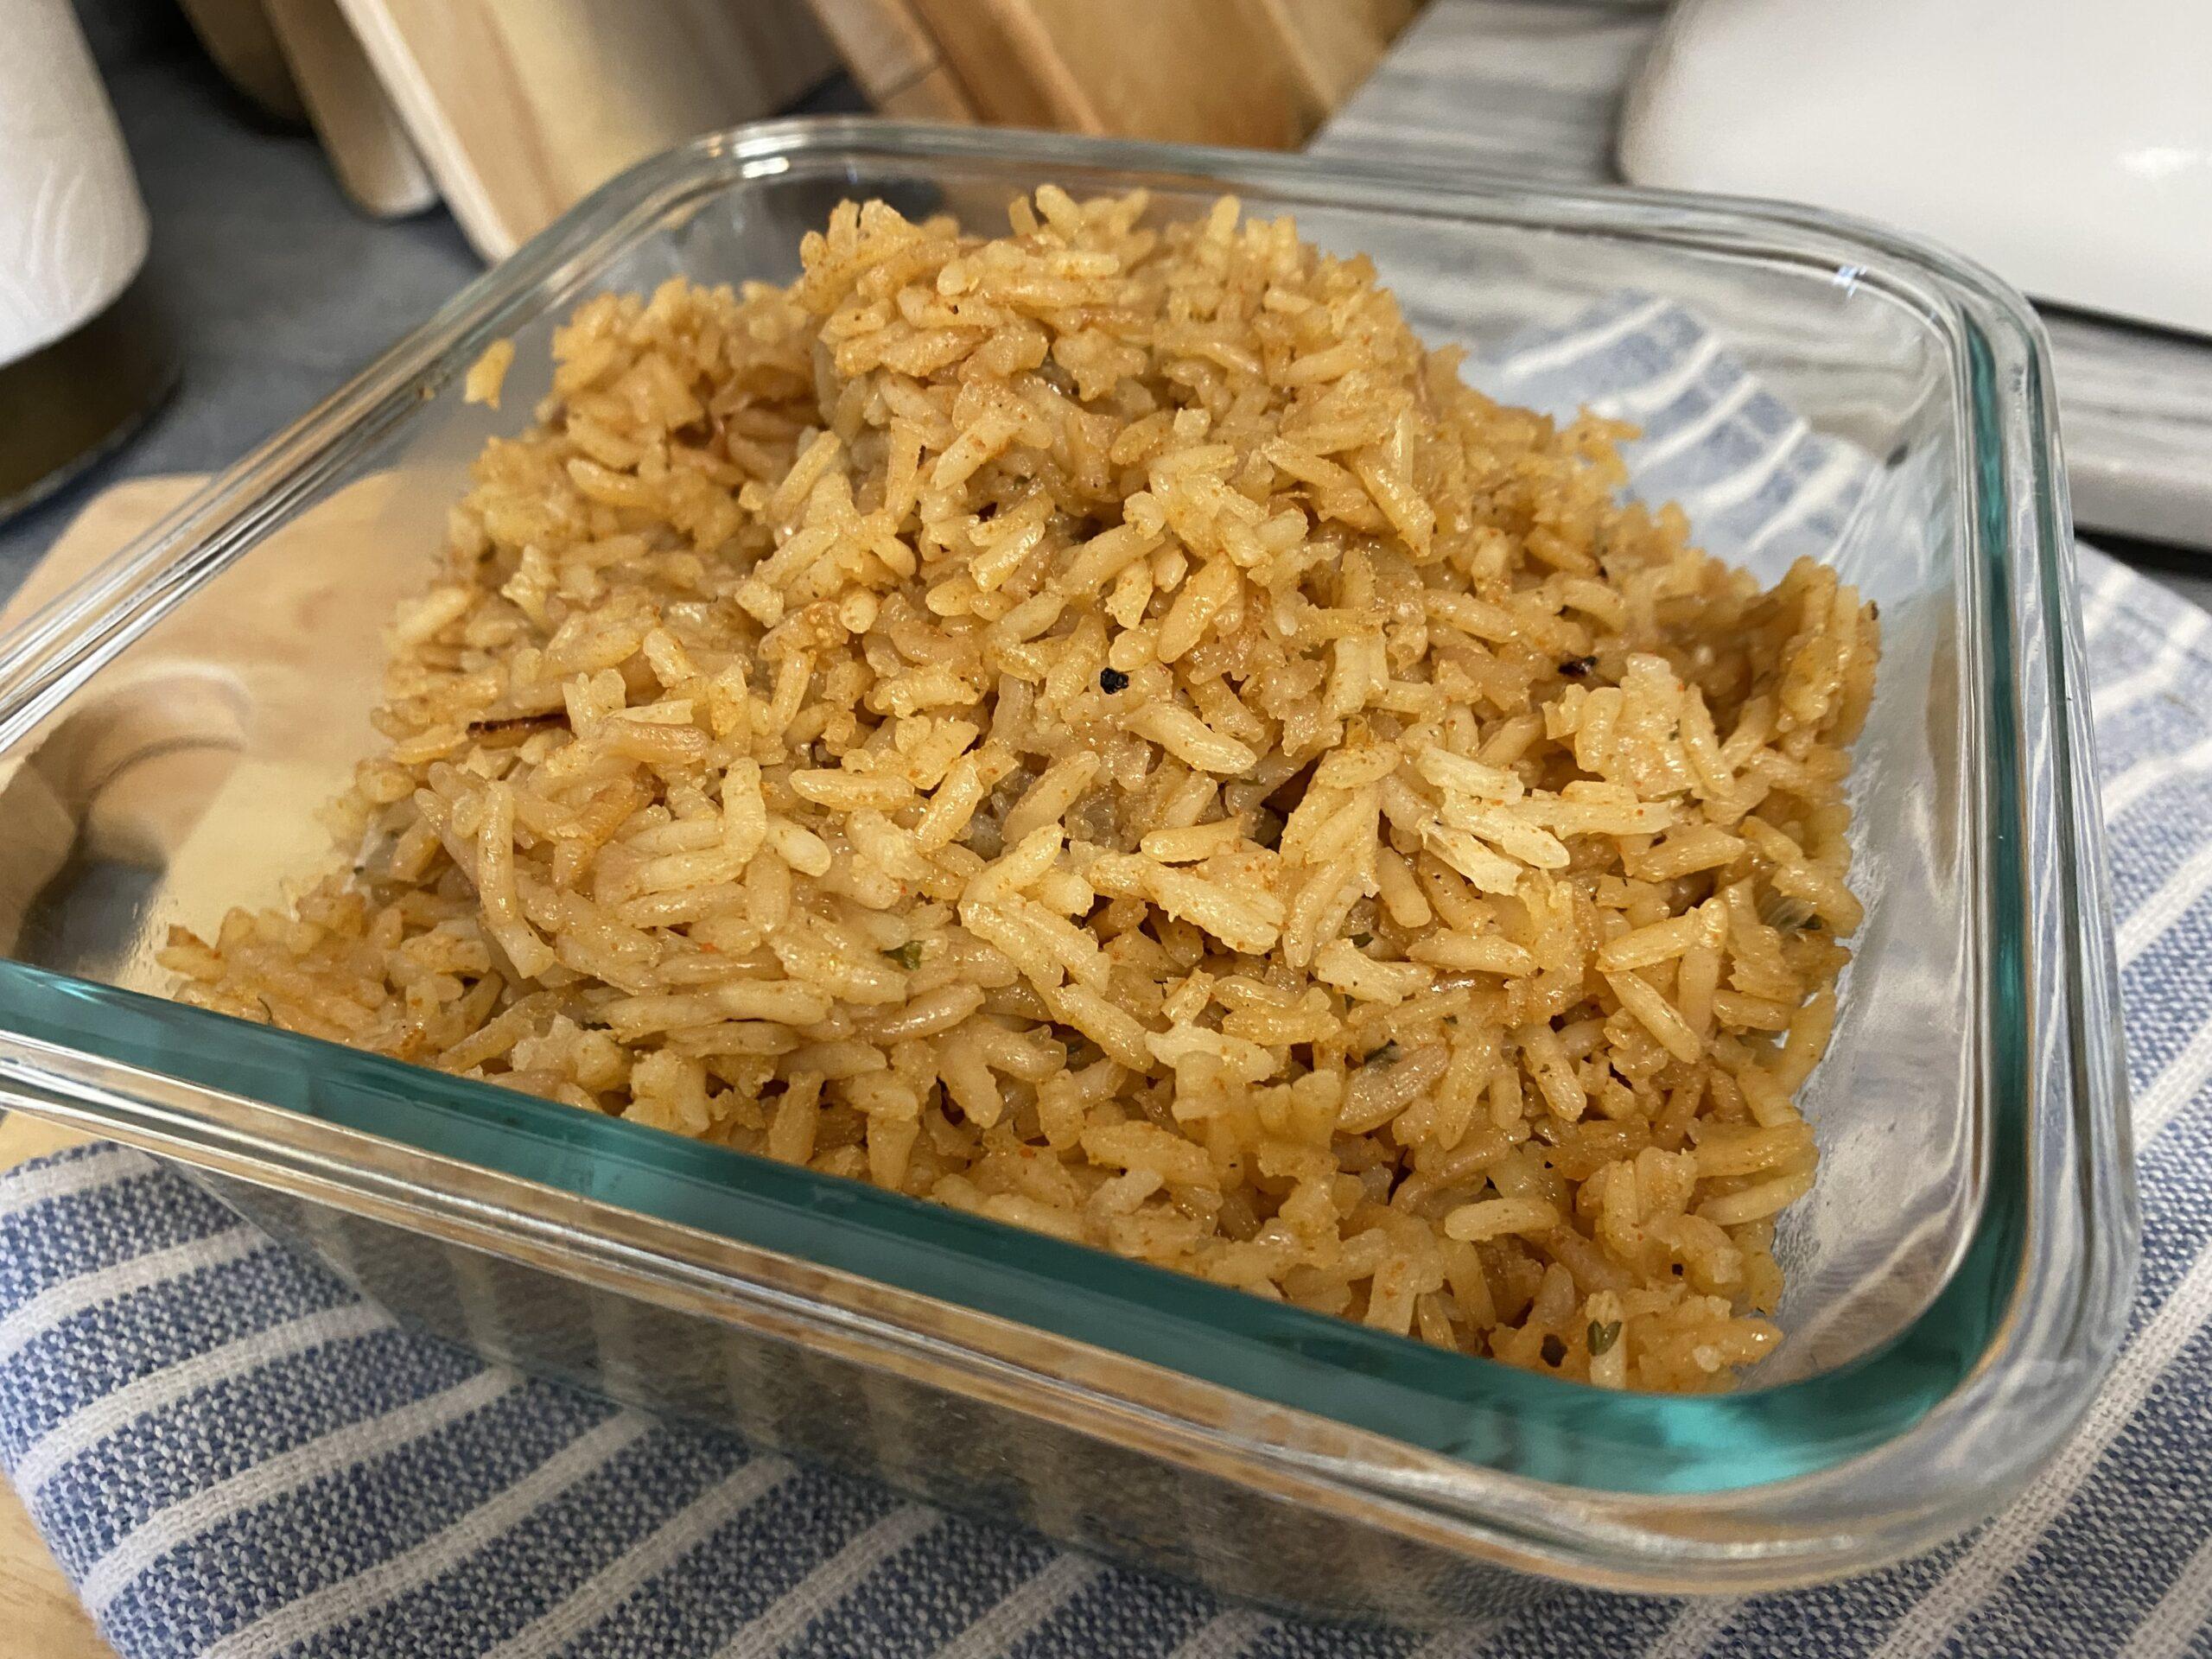 Cheryl's Texas Roadhouse Rice (copy cat)